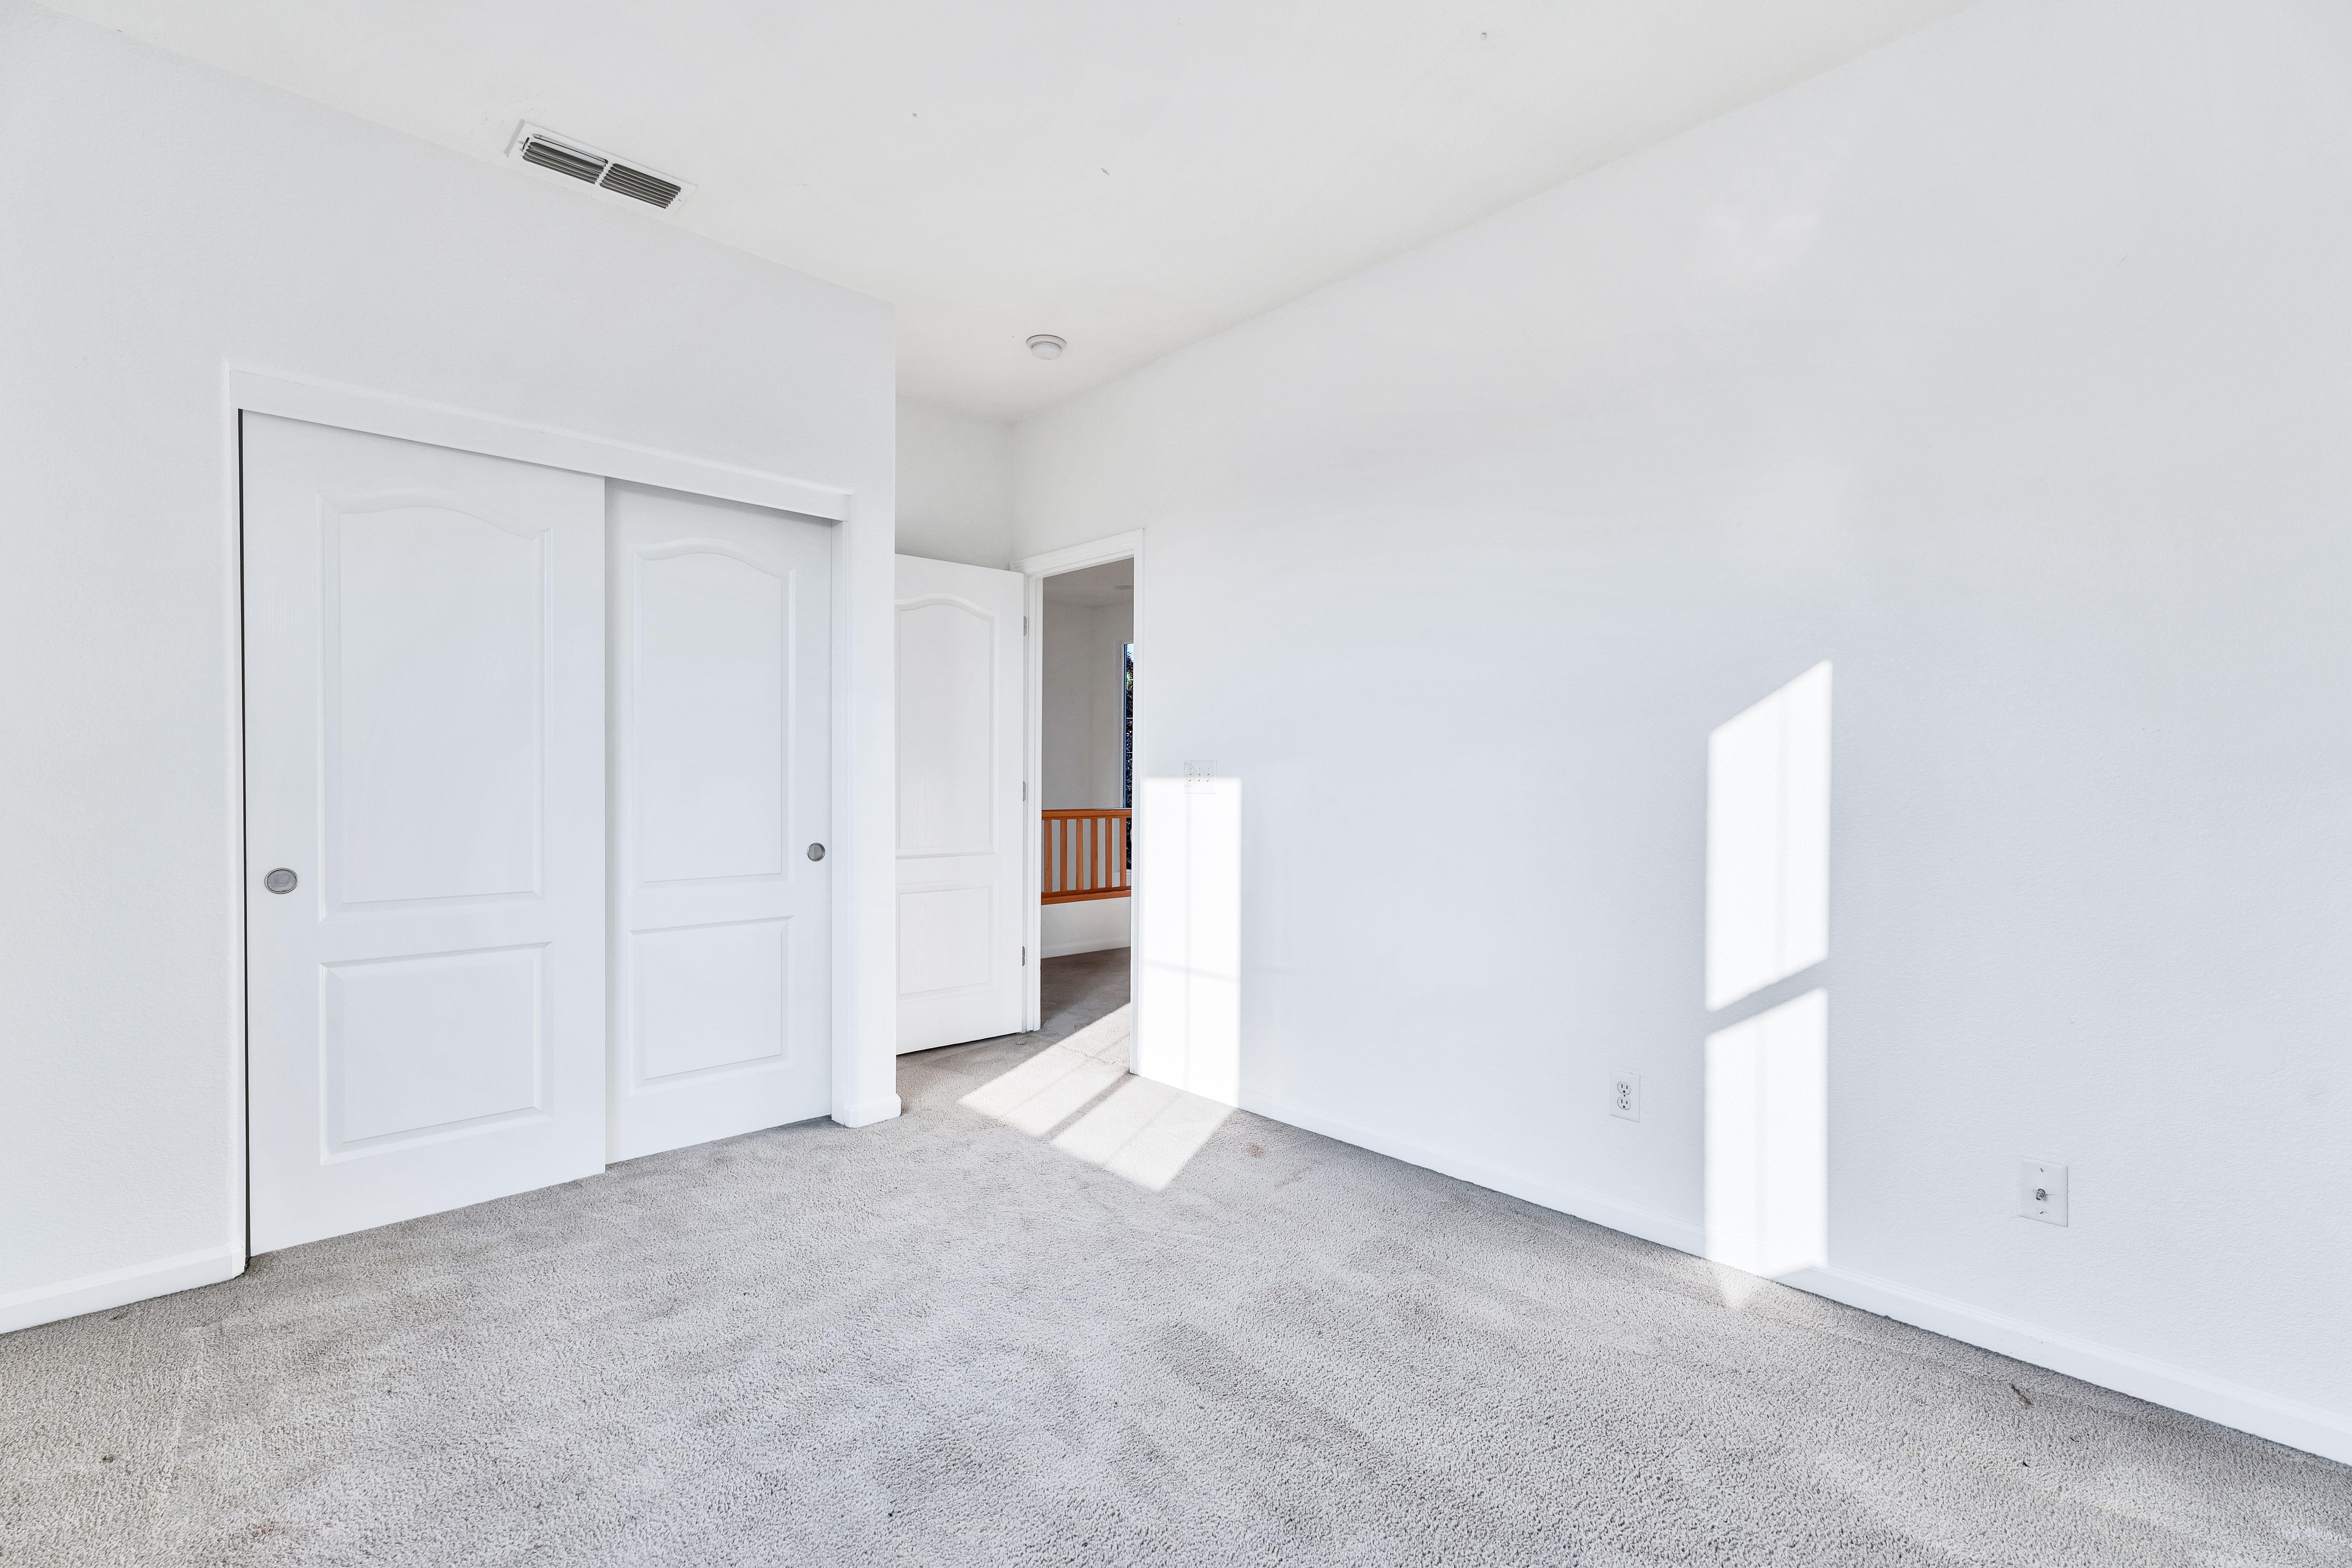 Second Bedroom of 17 Narwal Pl, Sacramento, Ca 95835